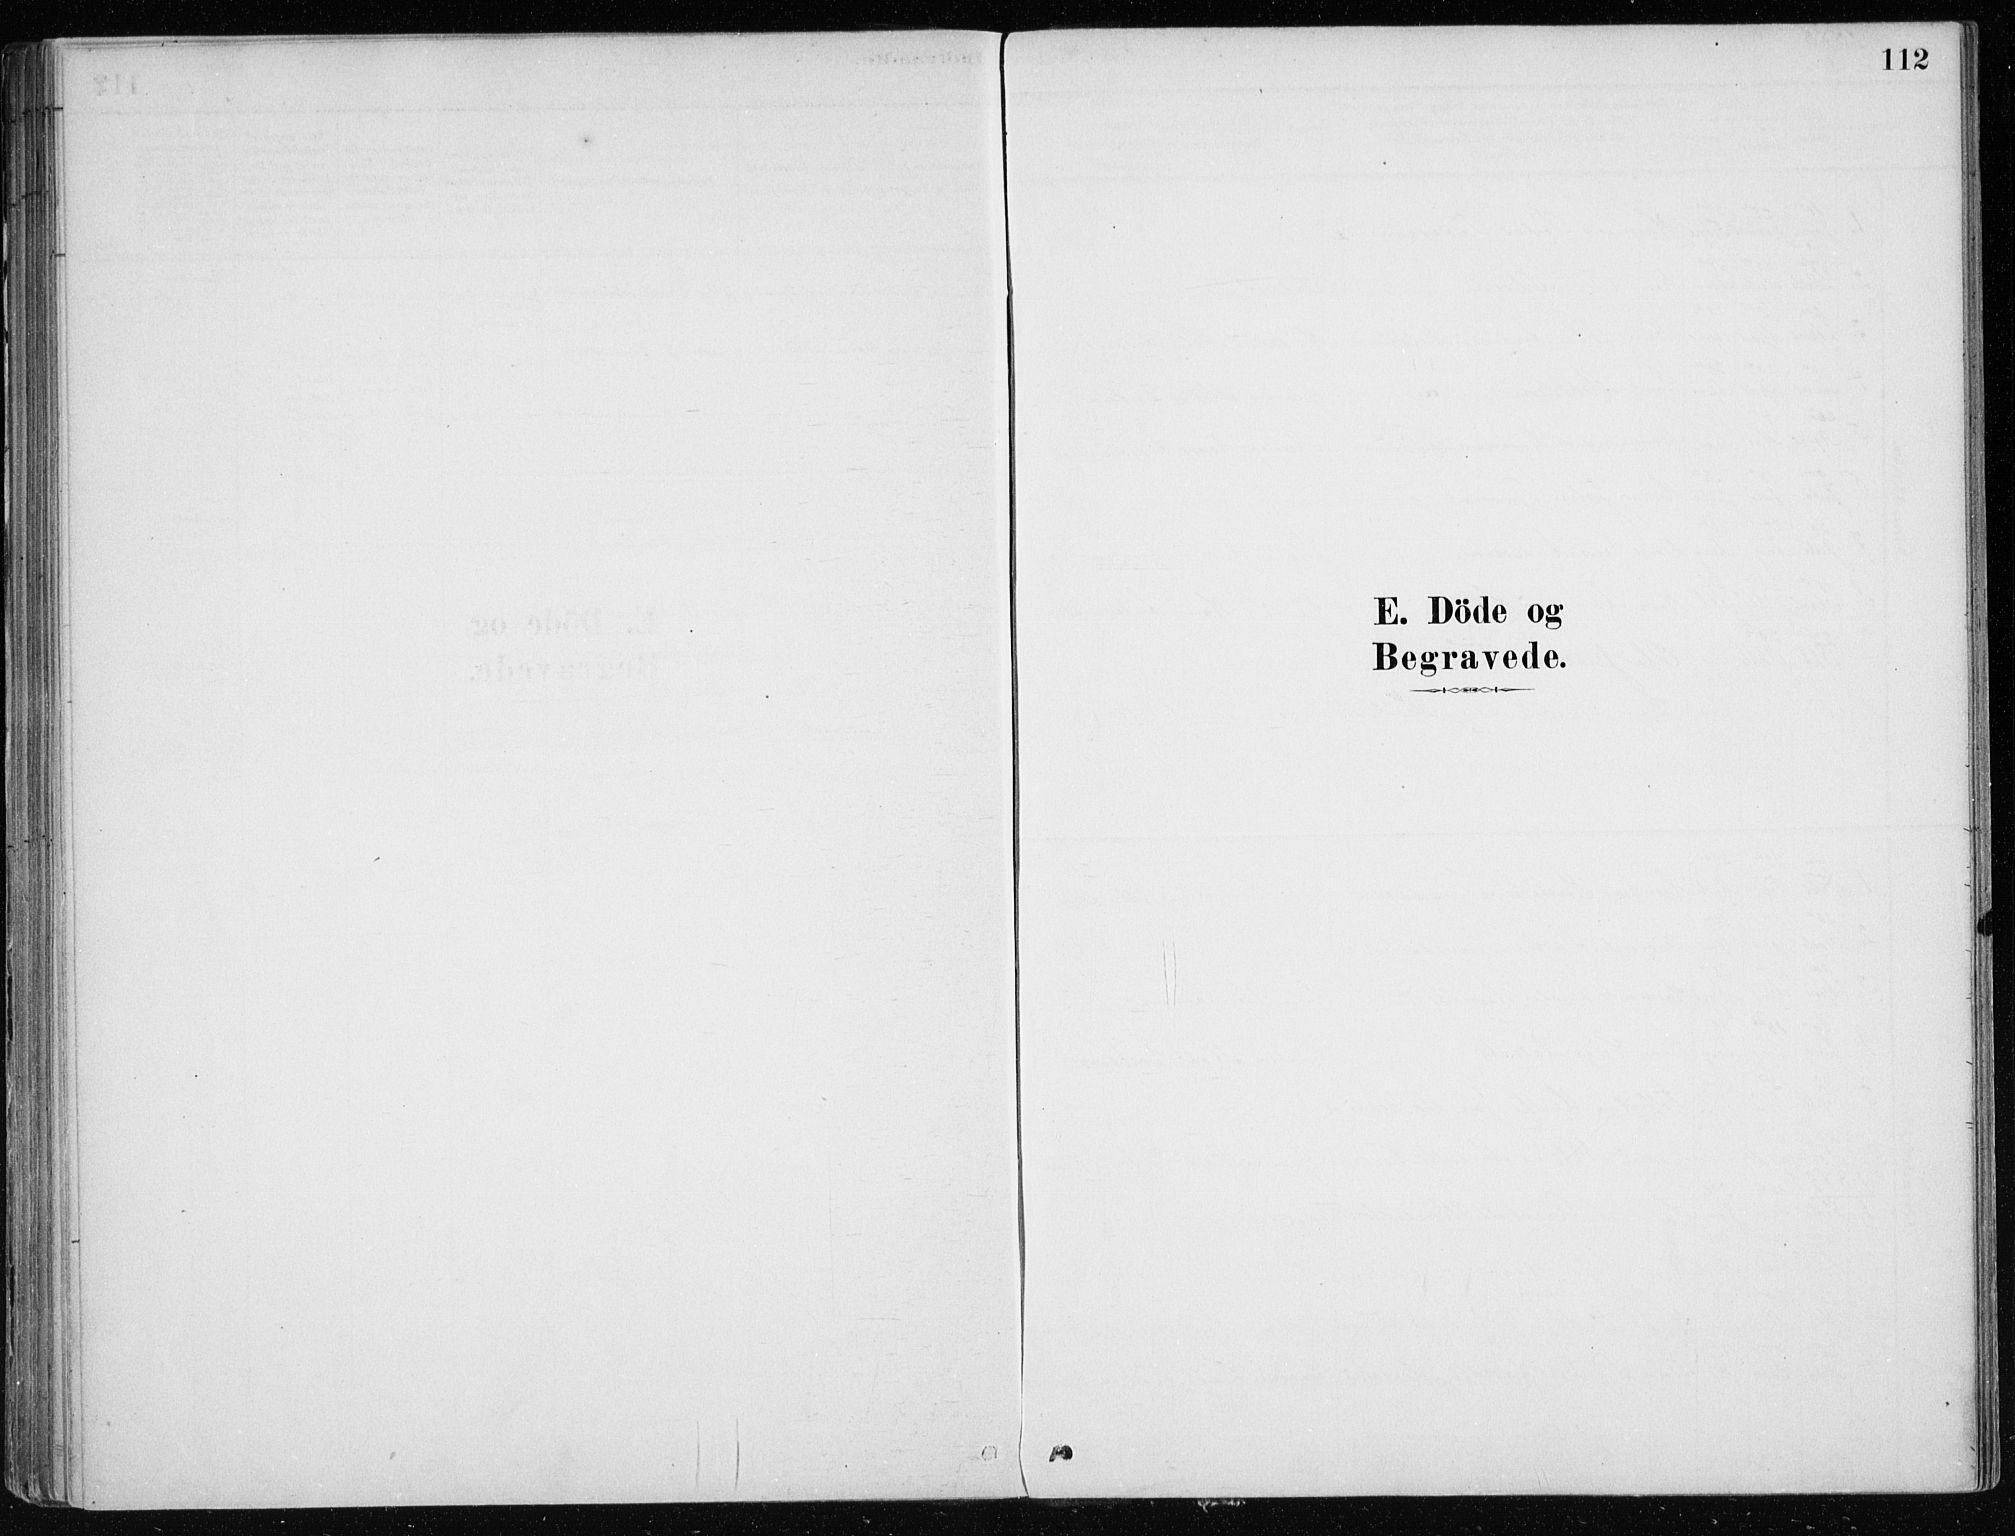 SAB, Sogndal Sokneprestembete, H/Haa/Haac/L0001: Parish register (official) no. C 1, 1878-1907, p. 112